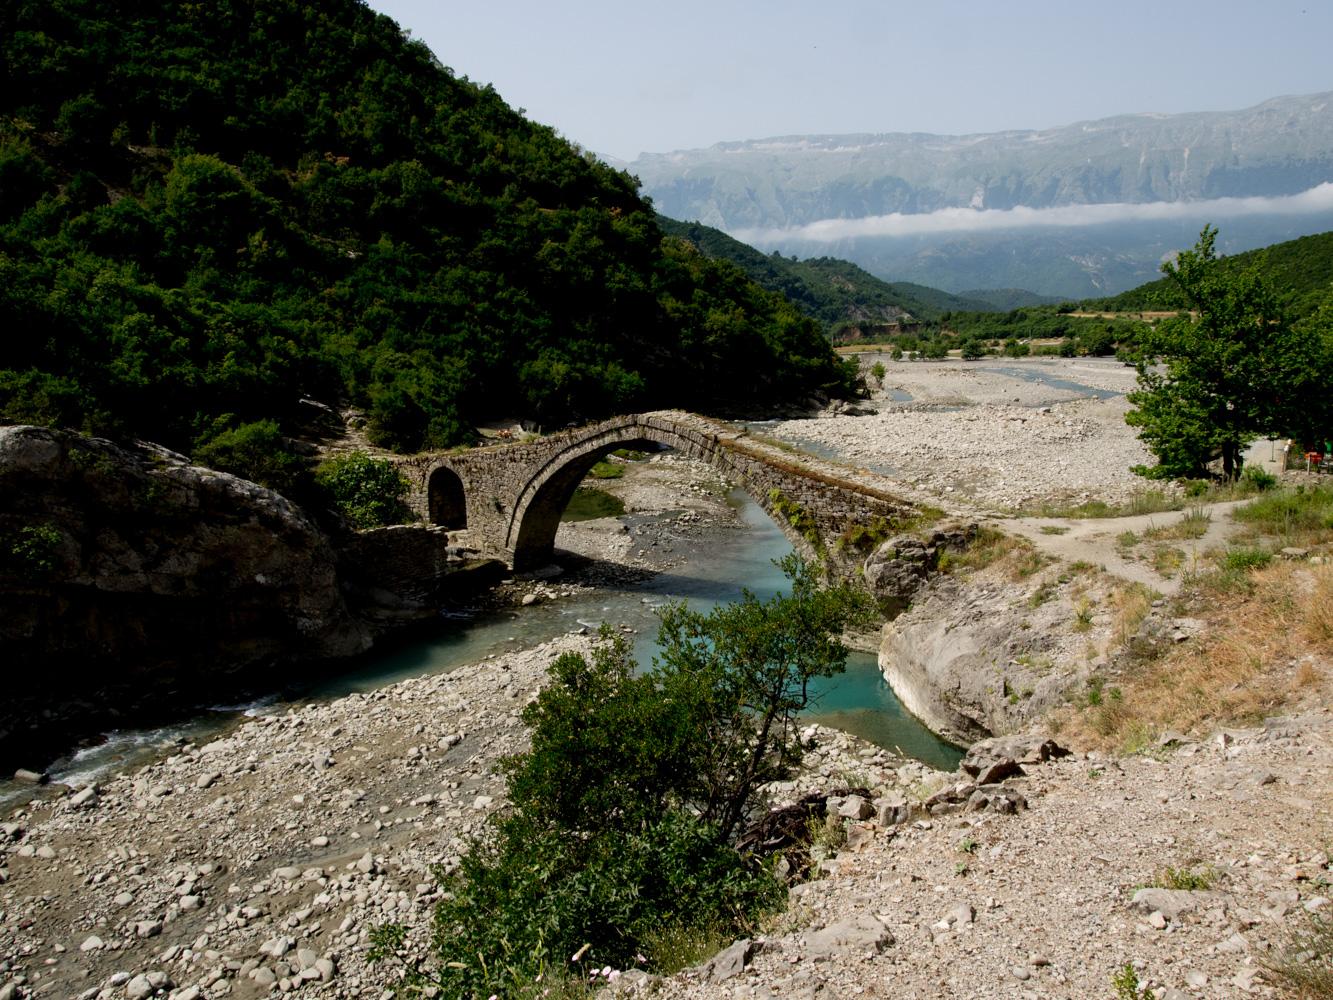 albania_permet_viosa-1-of-1-4